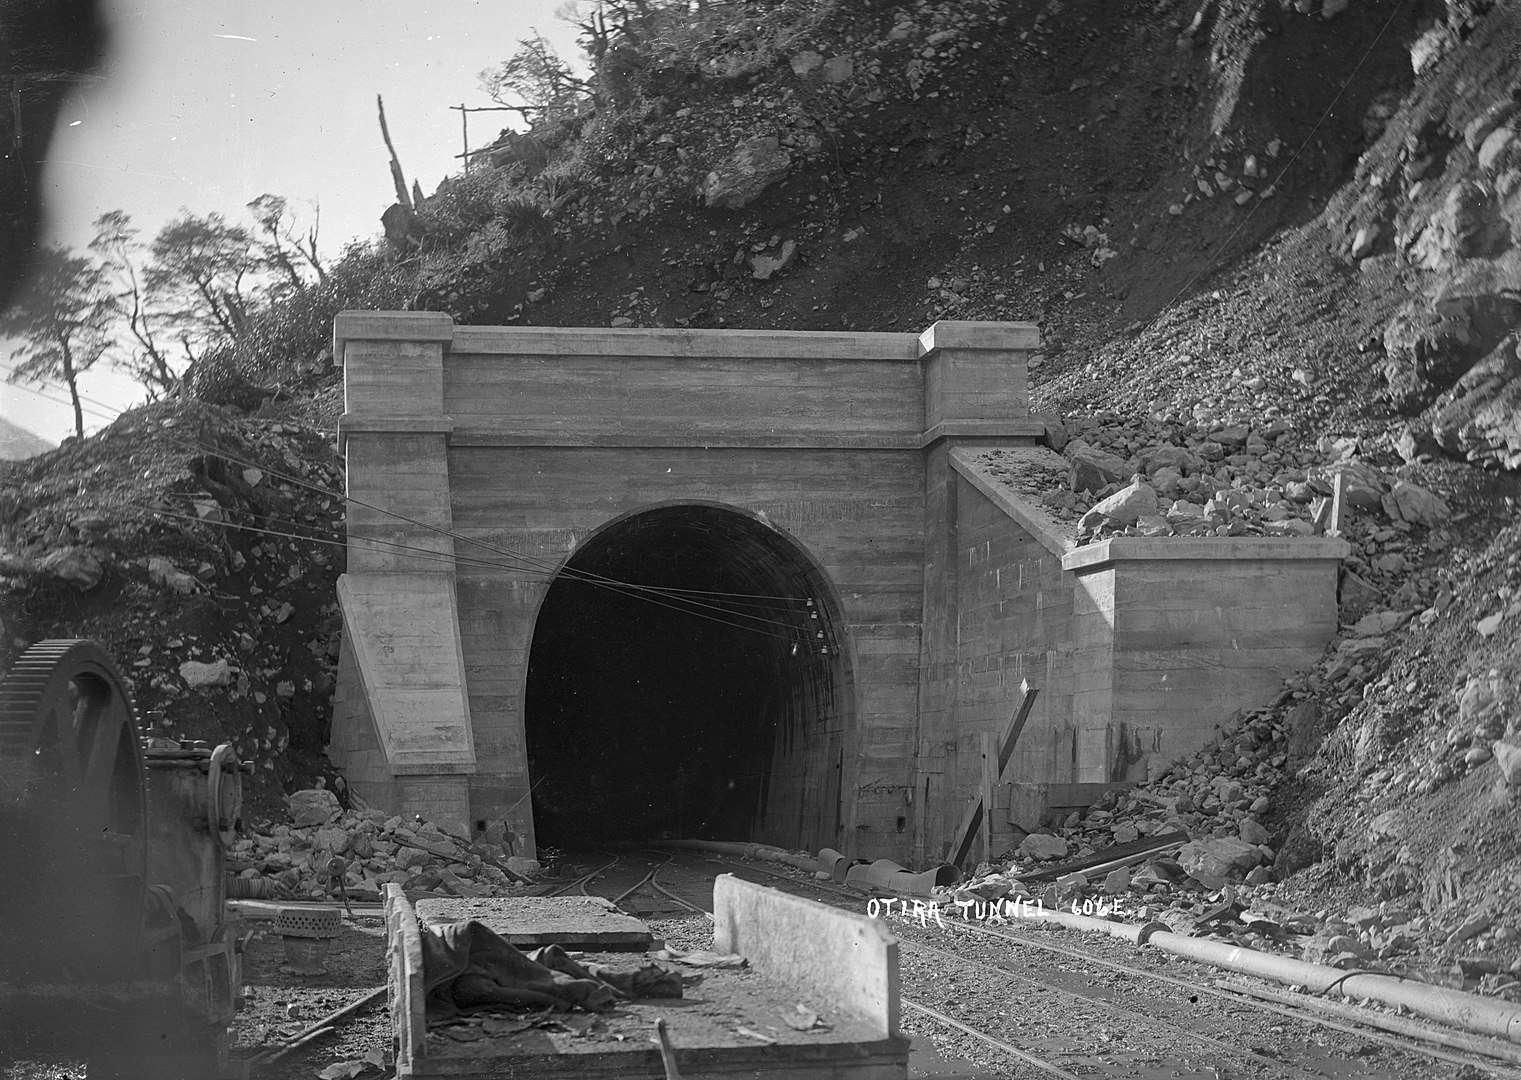 Otira Tunnel,New Zealand @William Archer Price